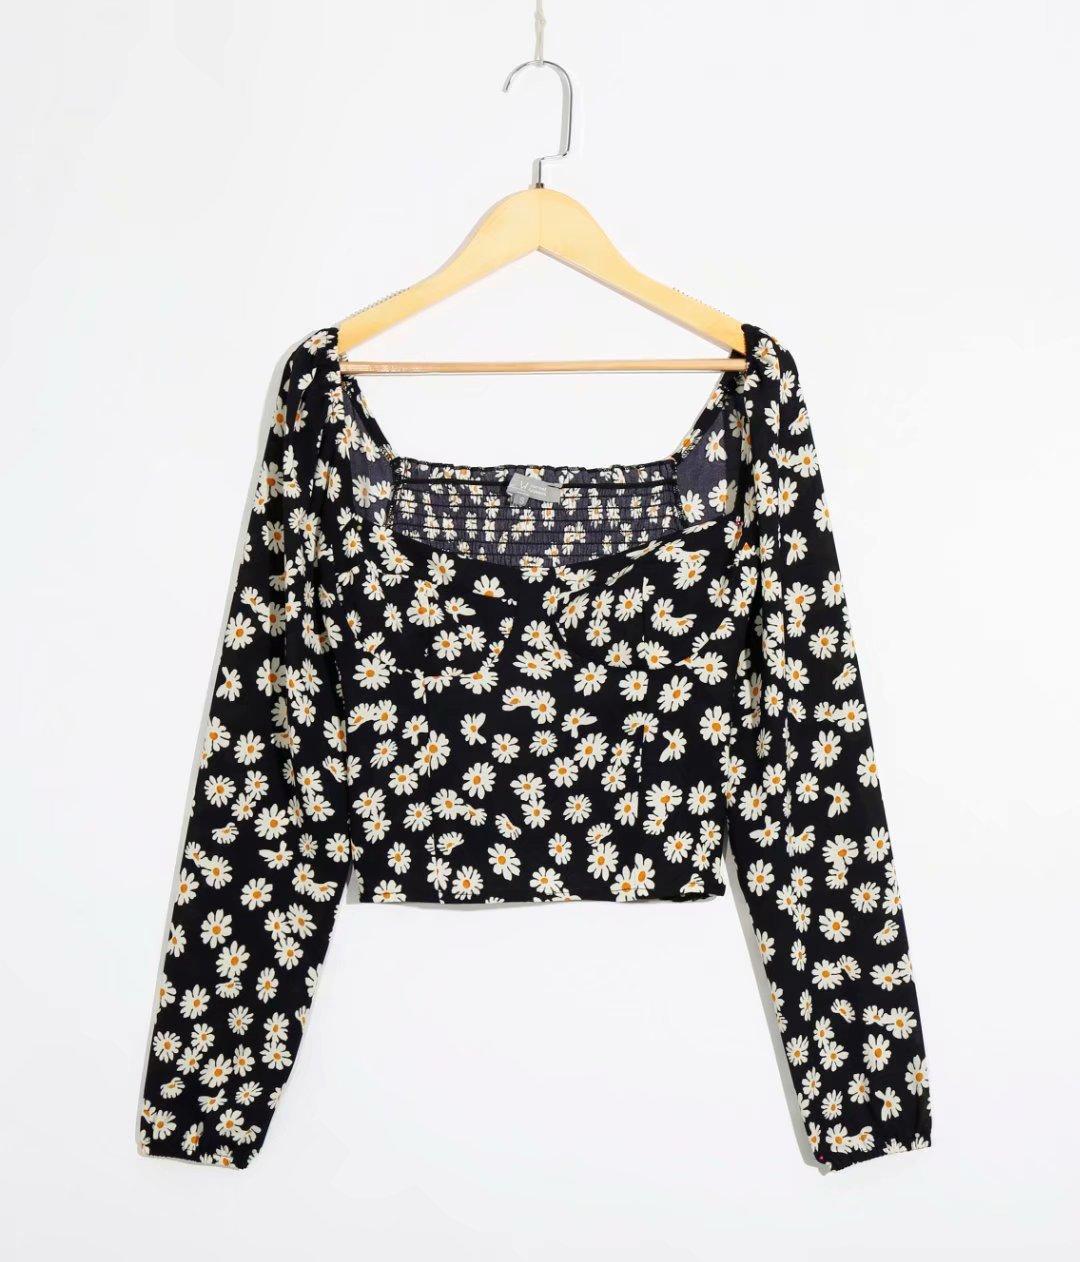 2020 European and American spring women's new wholesale sun flower long sleeve printed shirt